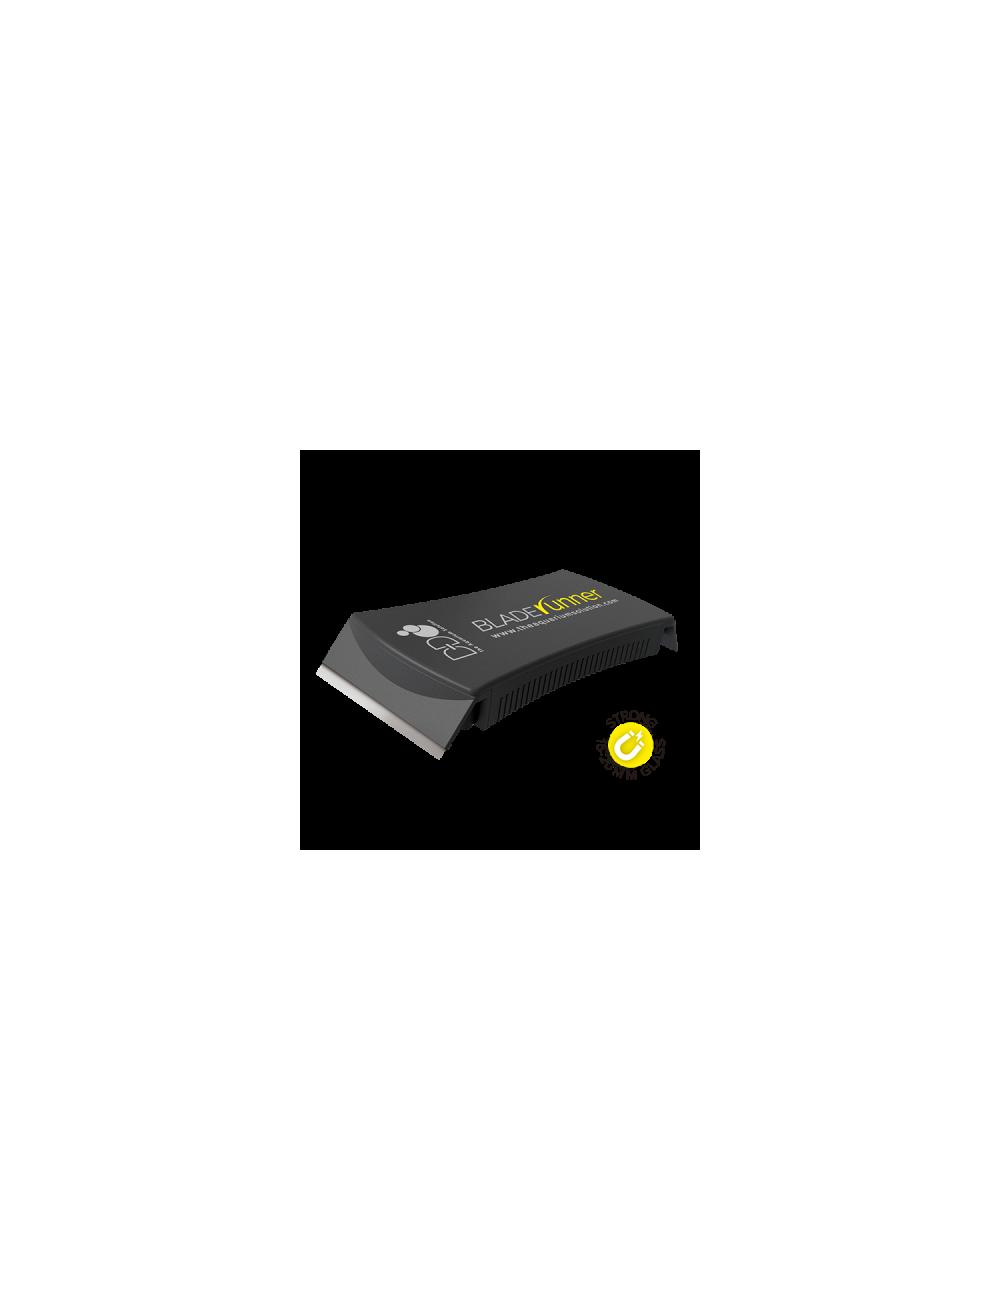 D-D - BladeRunner Magnet cleaner - Strong (15-20 mm) - Aimant de nettoyage ultra-mince